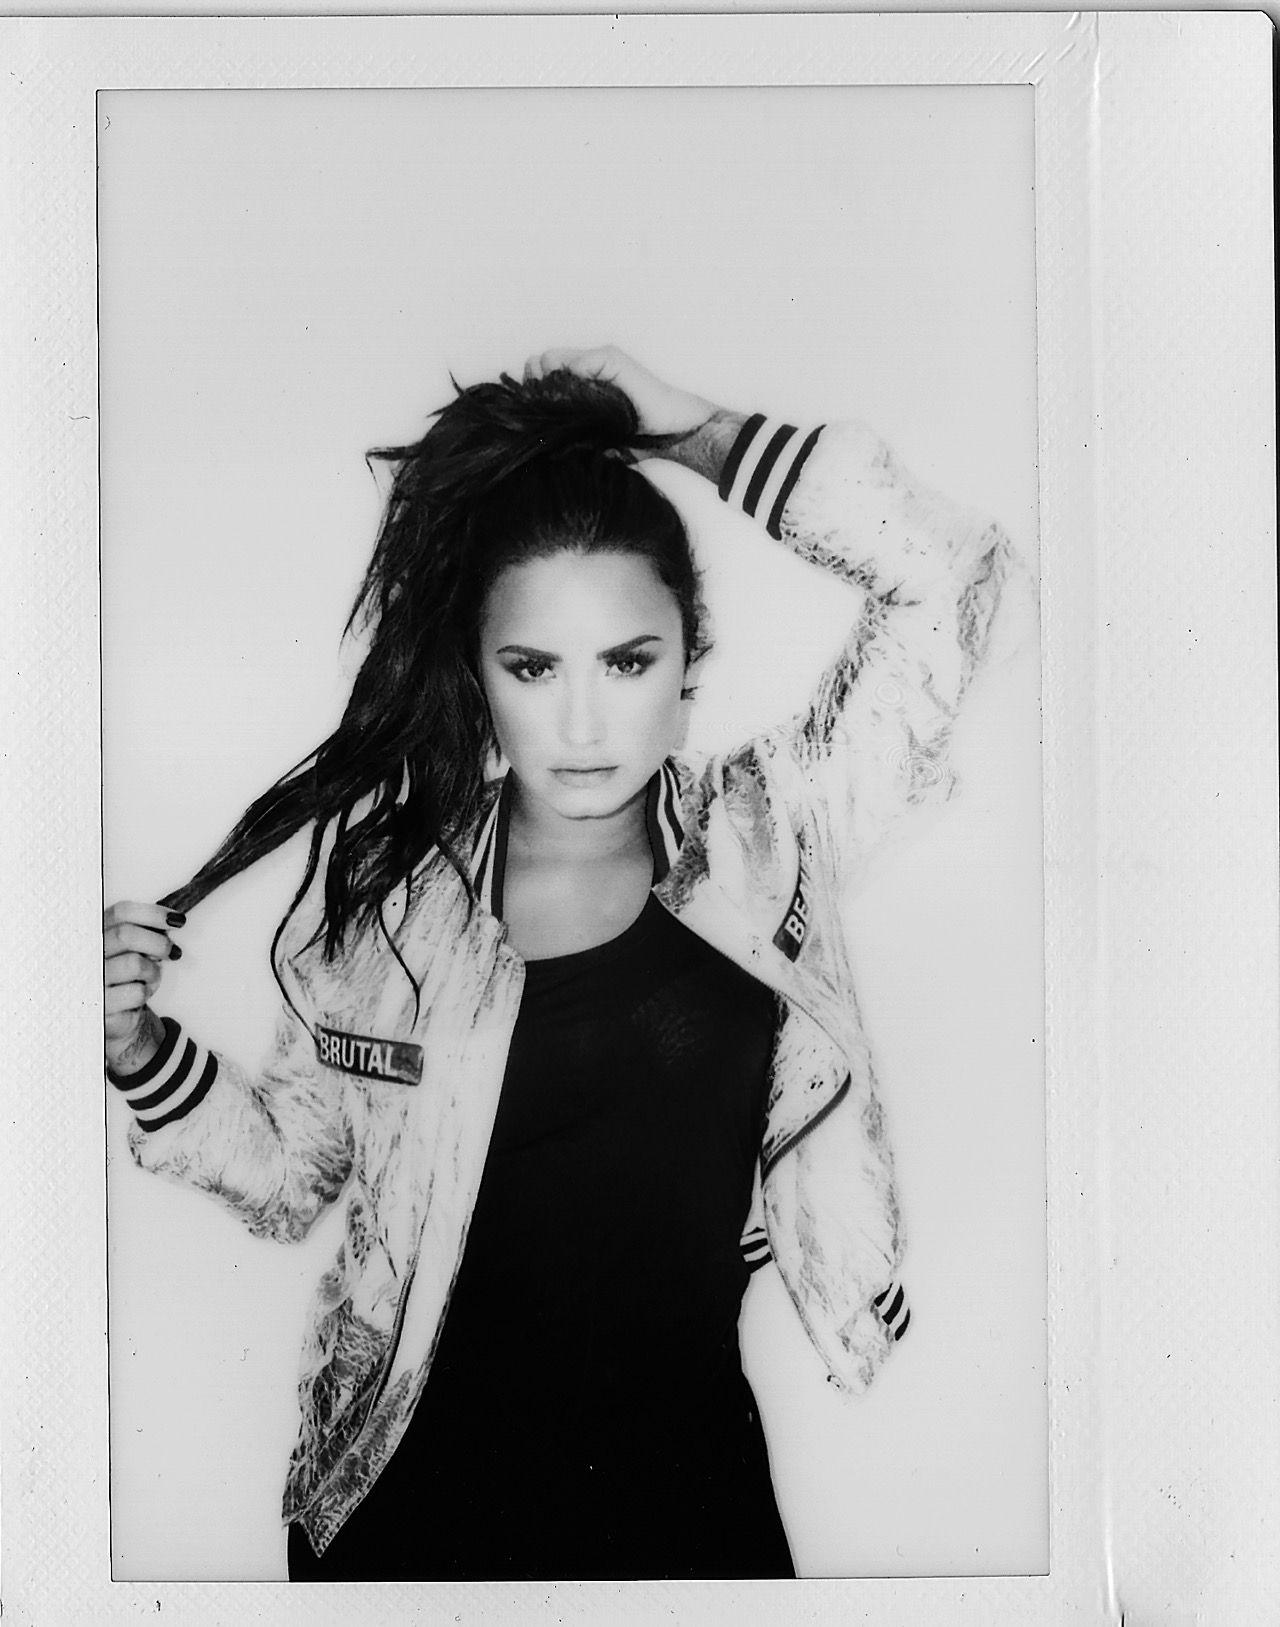 Demi Lovato Photoshoot, August 2017